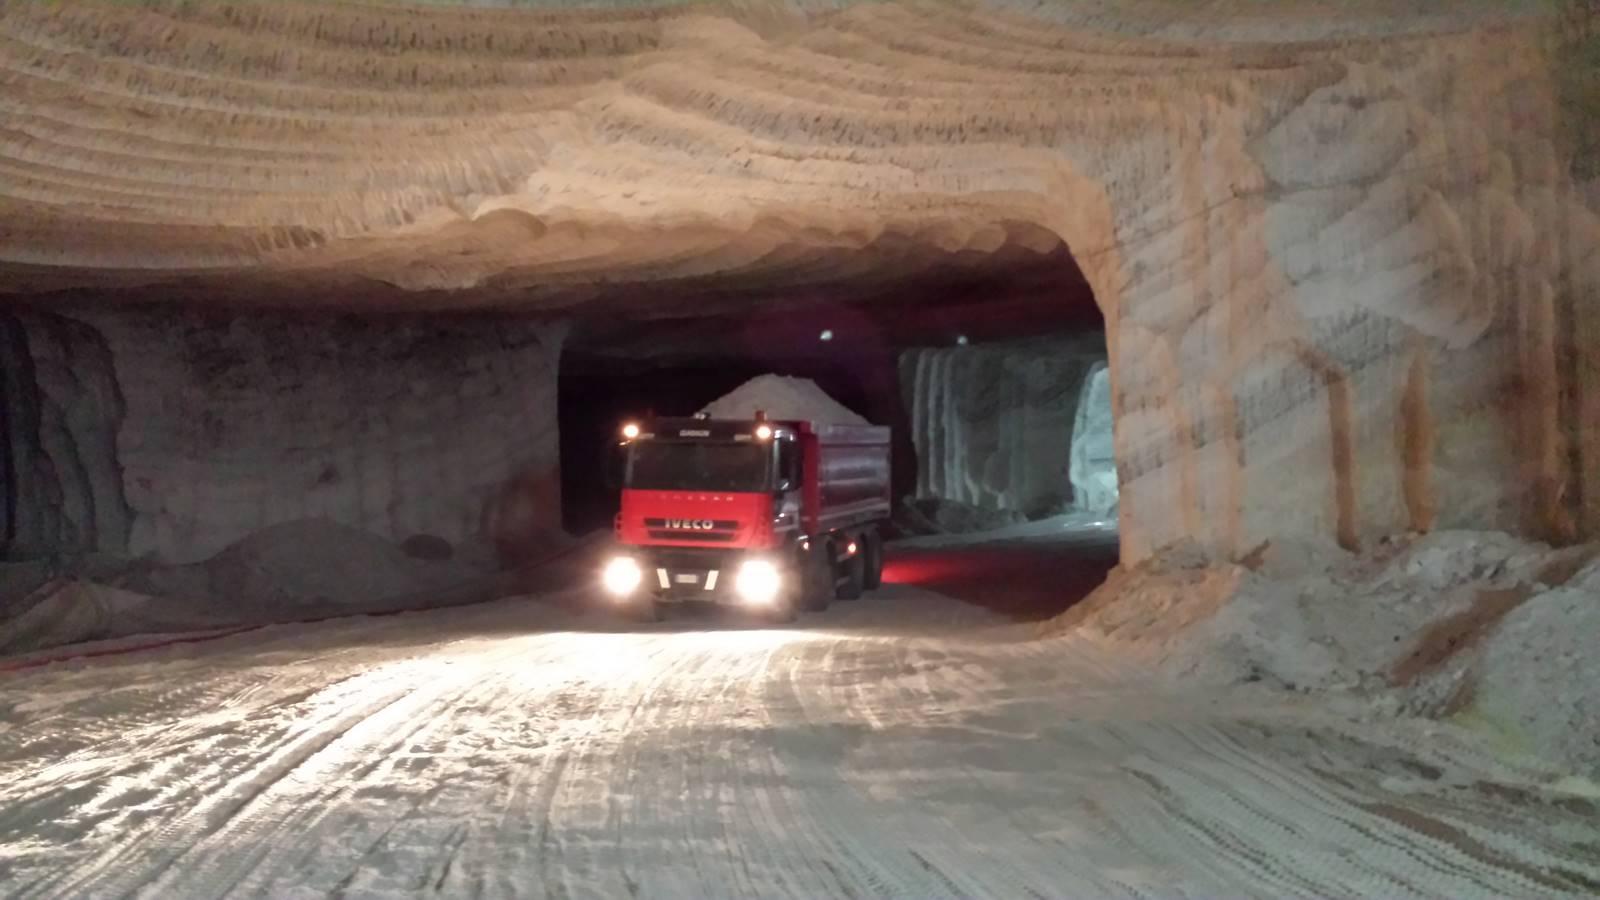 gallerie e rampe percorribili dai mezzi operativi